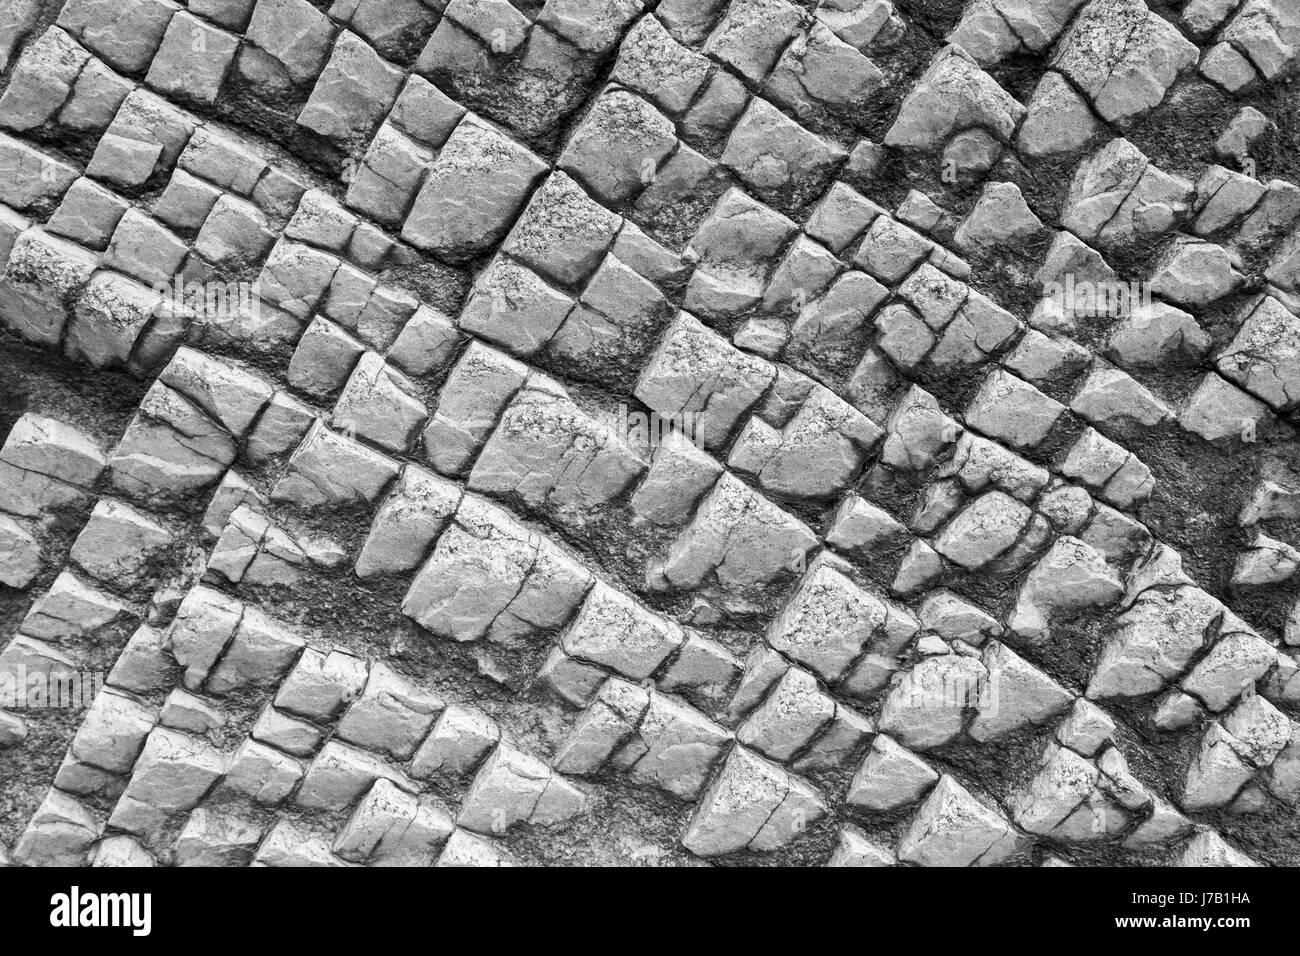 Close-up of a rock bizarre surface texture en noir&blanc. Photo Stock